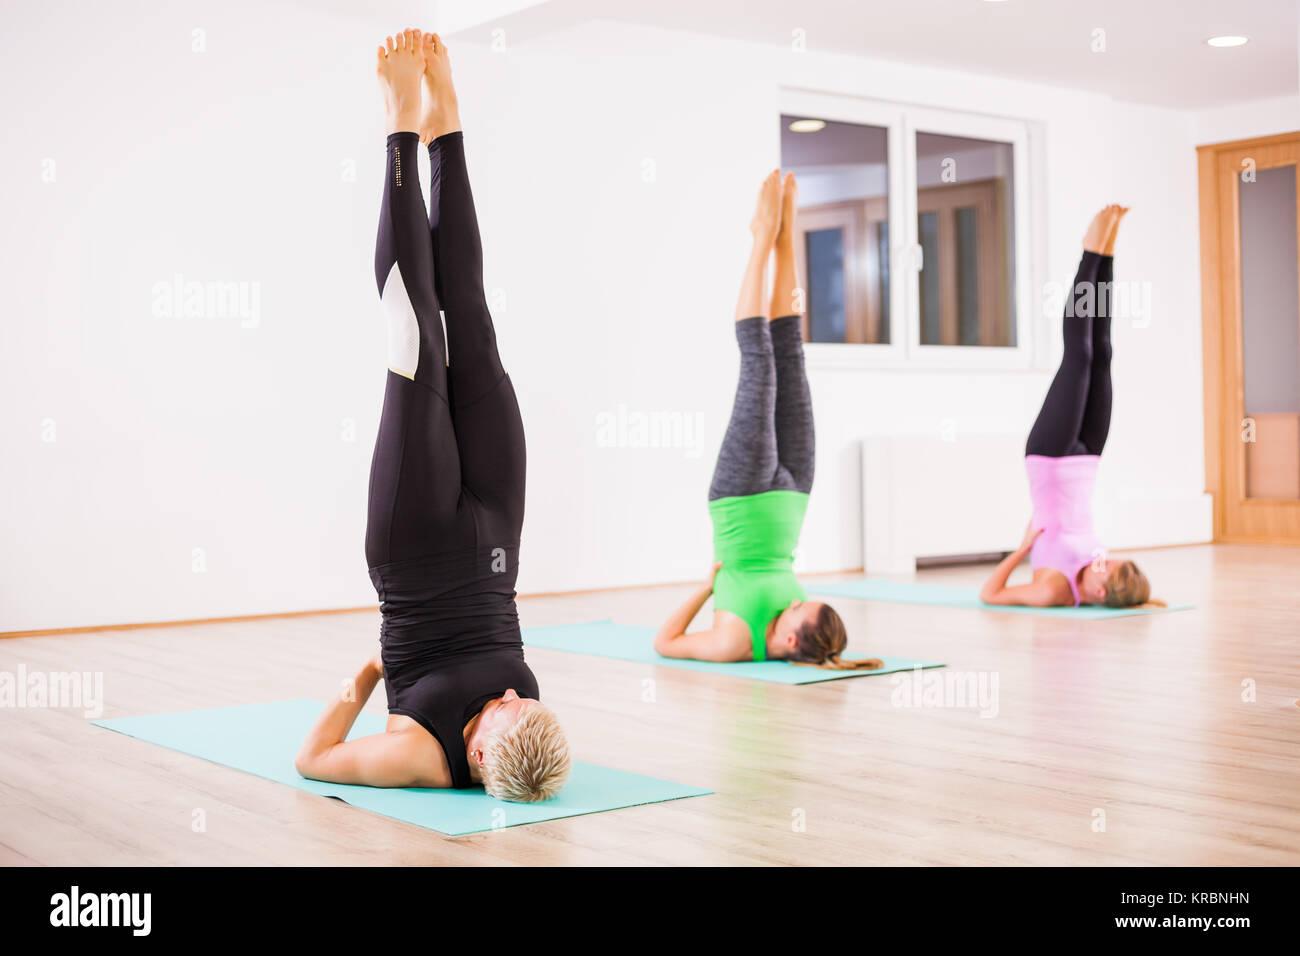 Trois jeunes filles pratiquant le yoga, Salamba Sarvangasana / stand d'épaule Photo Stock